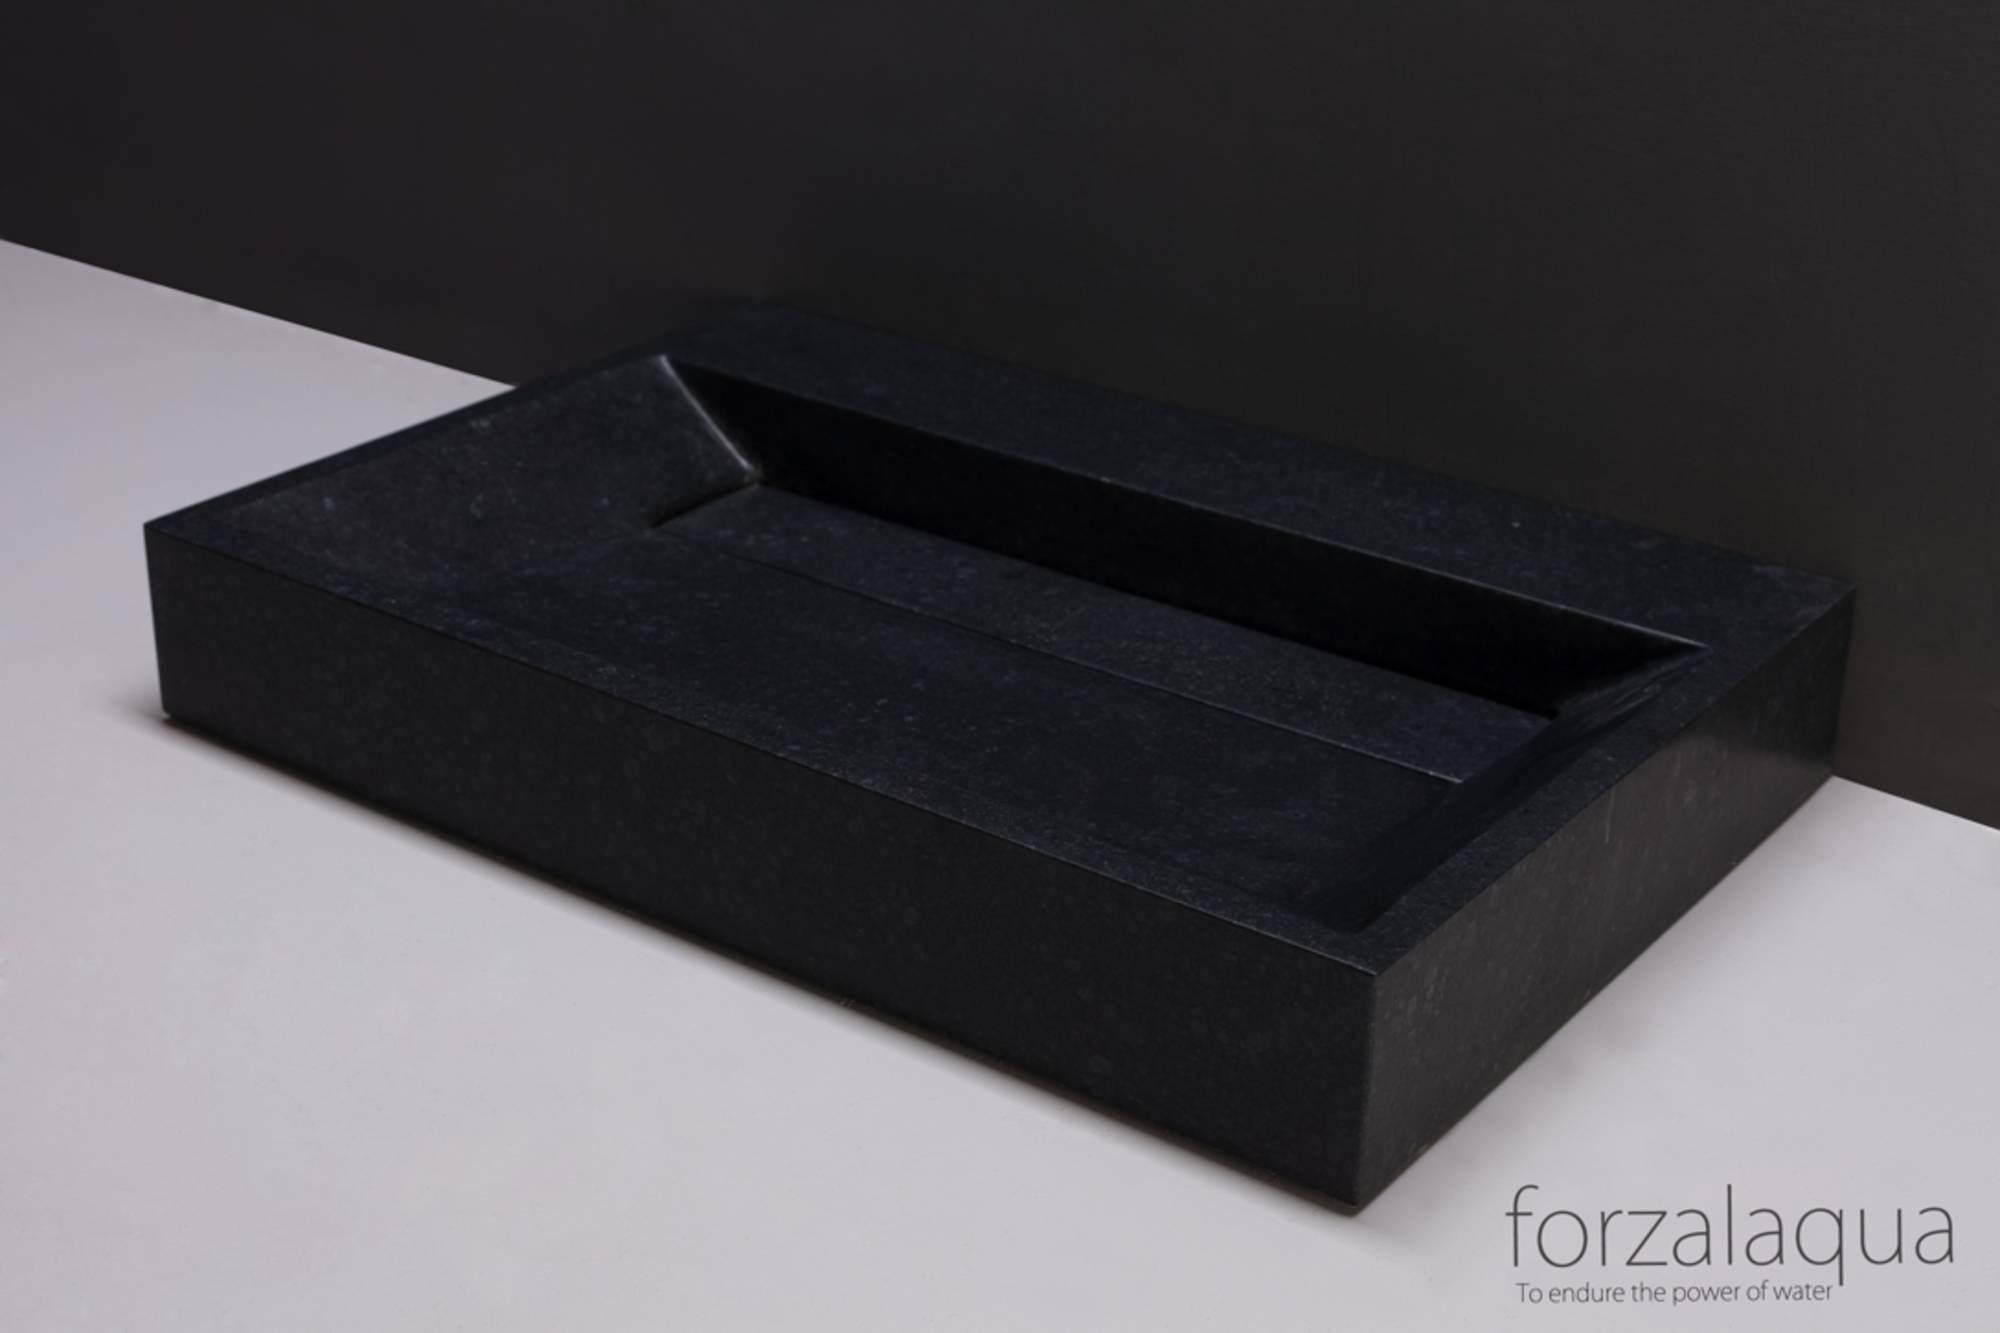 Forzalaqua Bellezza wastafel 80,5x51,5x9 cm Graniet gezoet